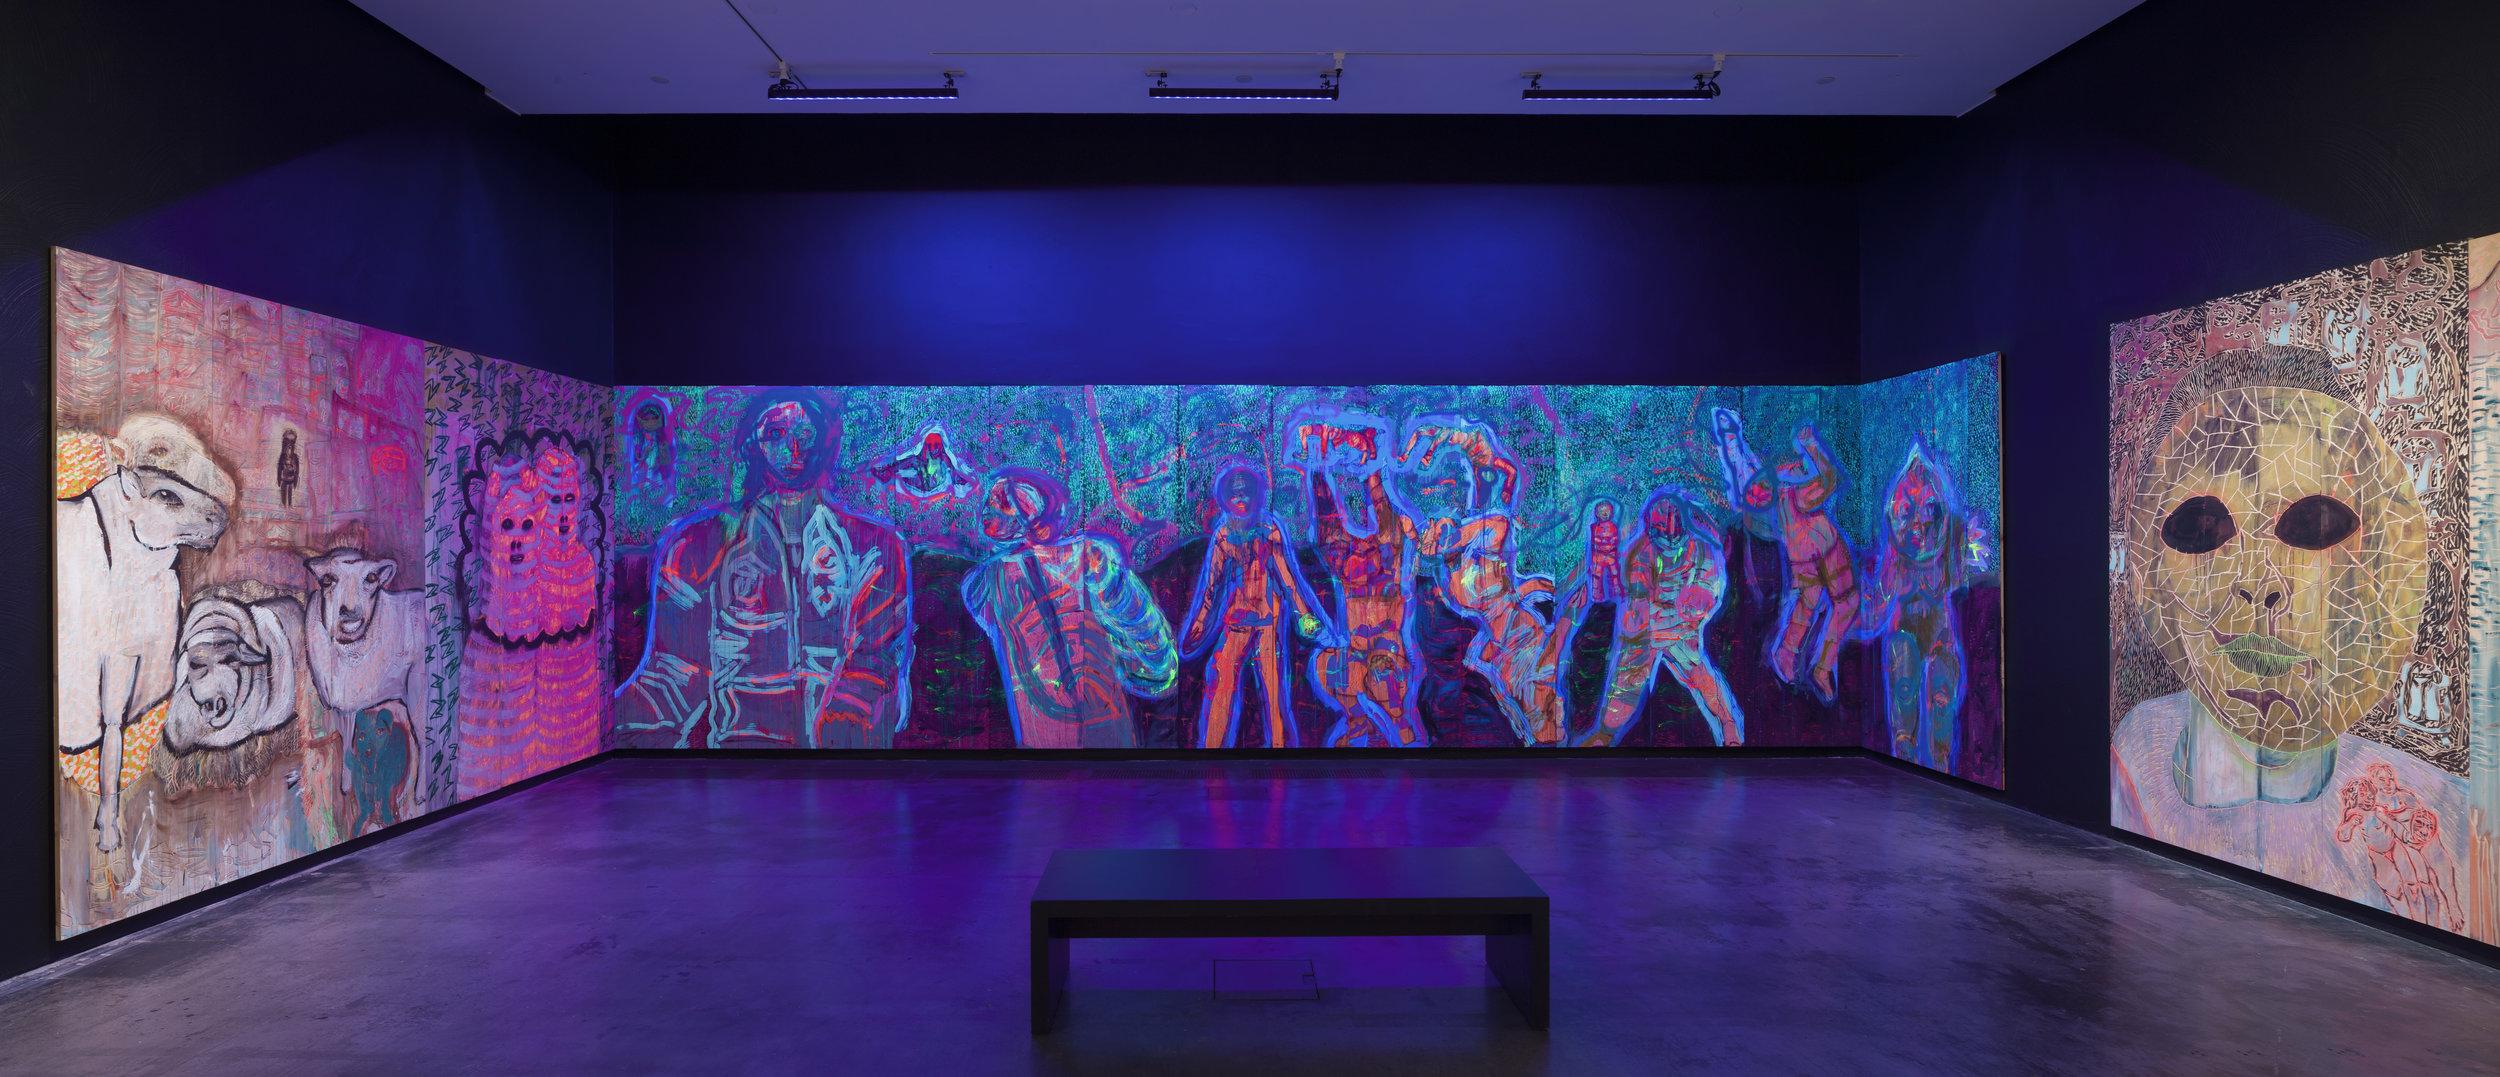 Installation view to Camilla Vuorenmaa's painting installation  Chamber , 2017, at the Ars Fennica nominee exhibition in Kiasma October 2017 – February 2018. Photo: Finnish National Gallery / Pirje Mykkänen